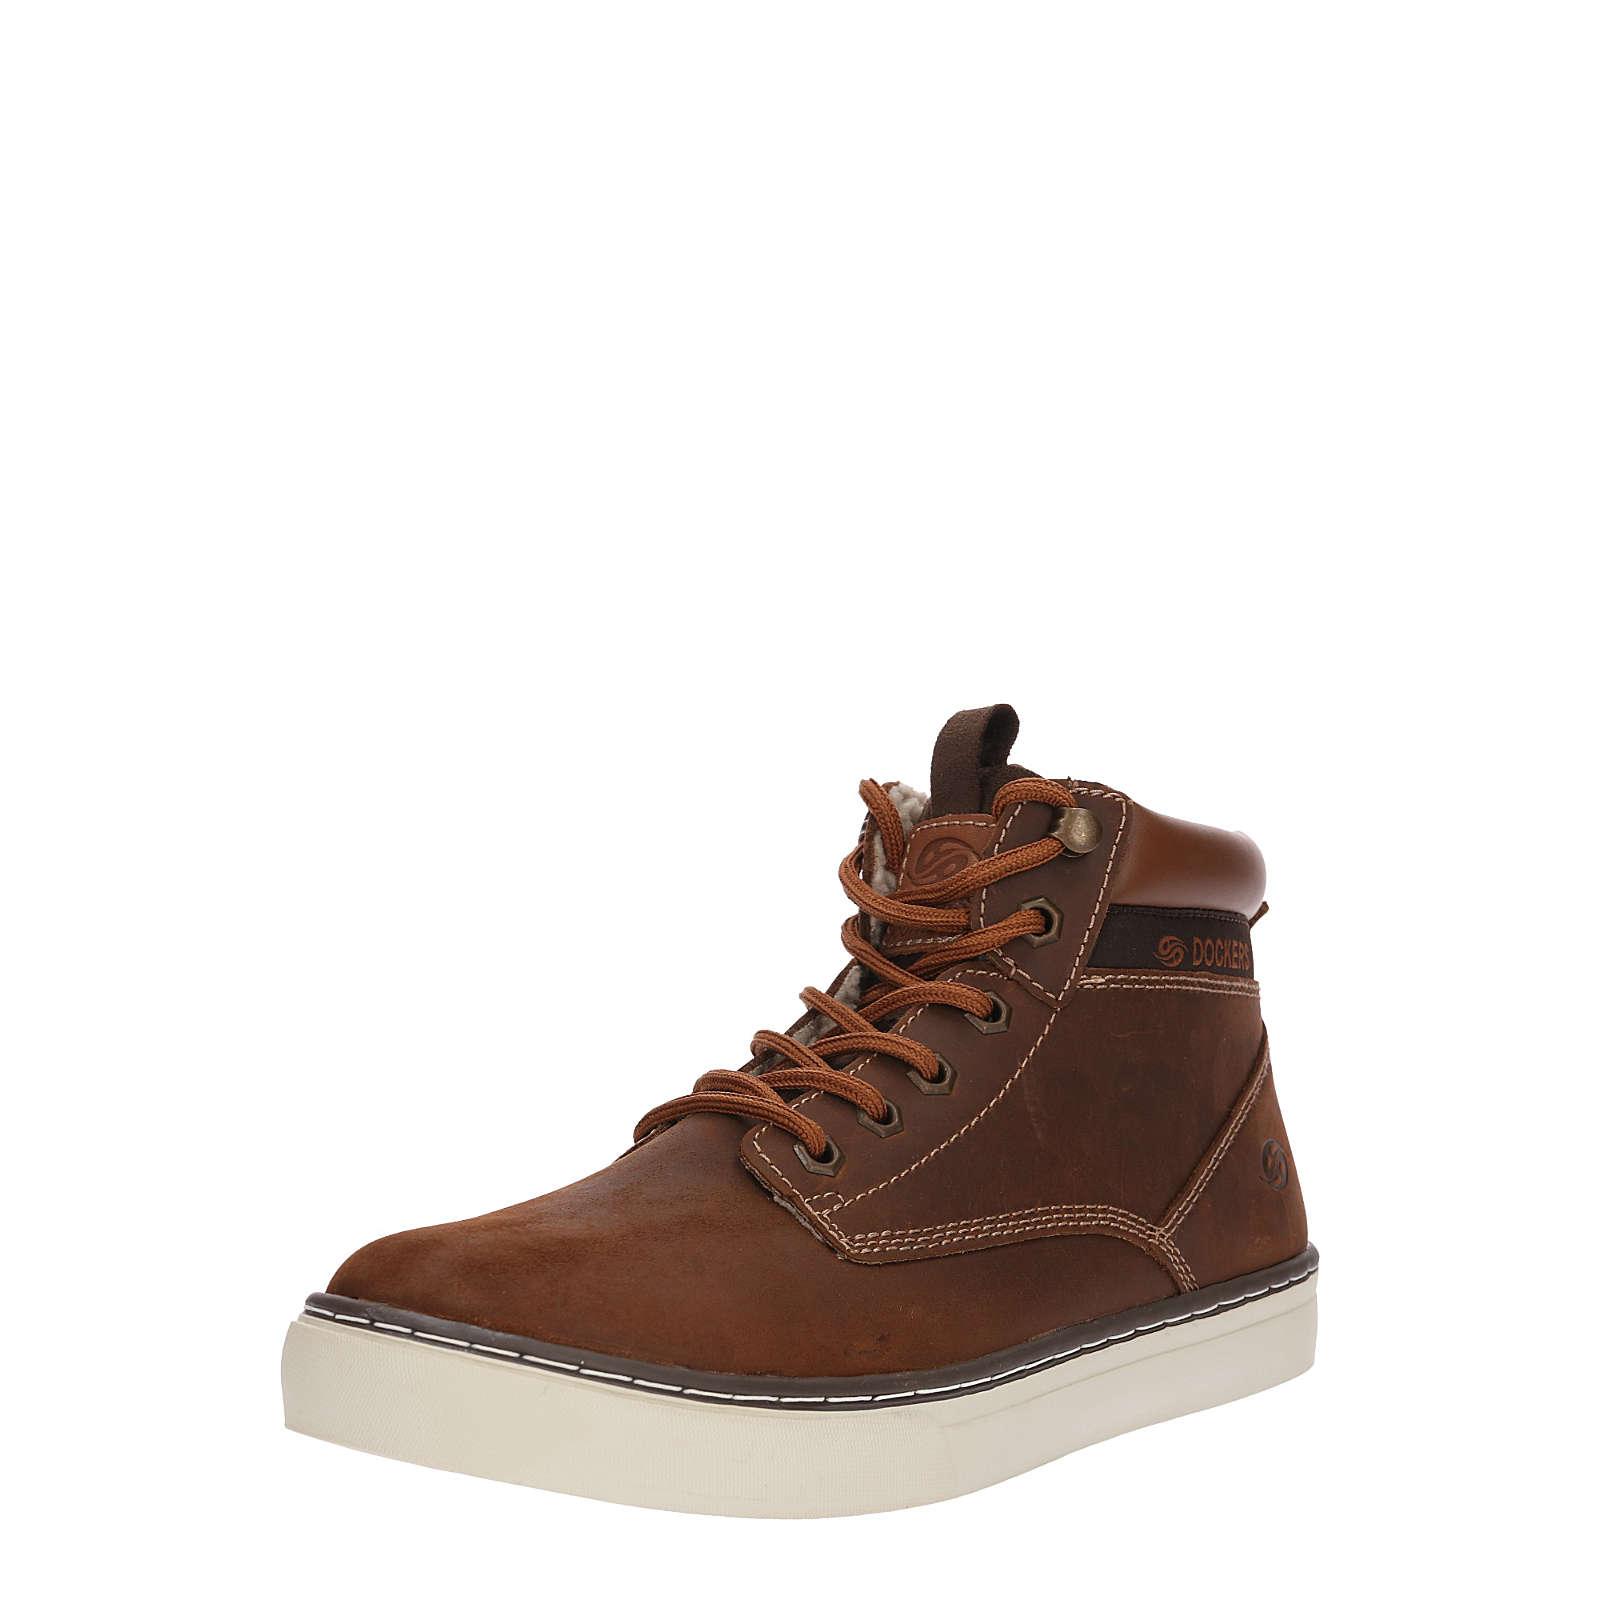 Dockers by Gerli Sneaker high Sneakers High braun Herren Gr. 41